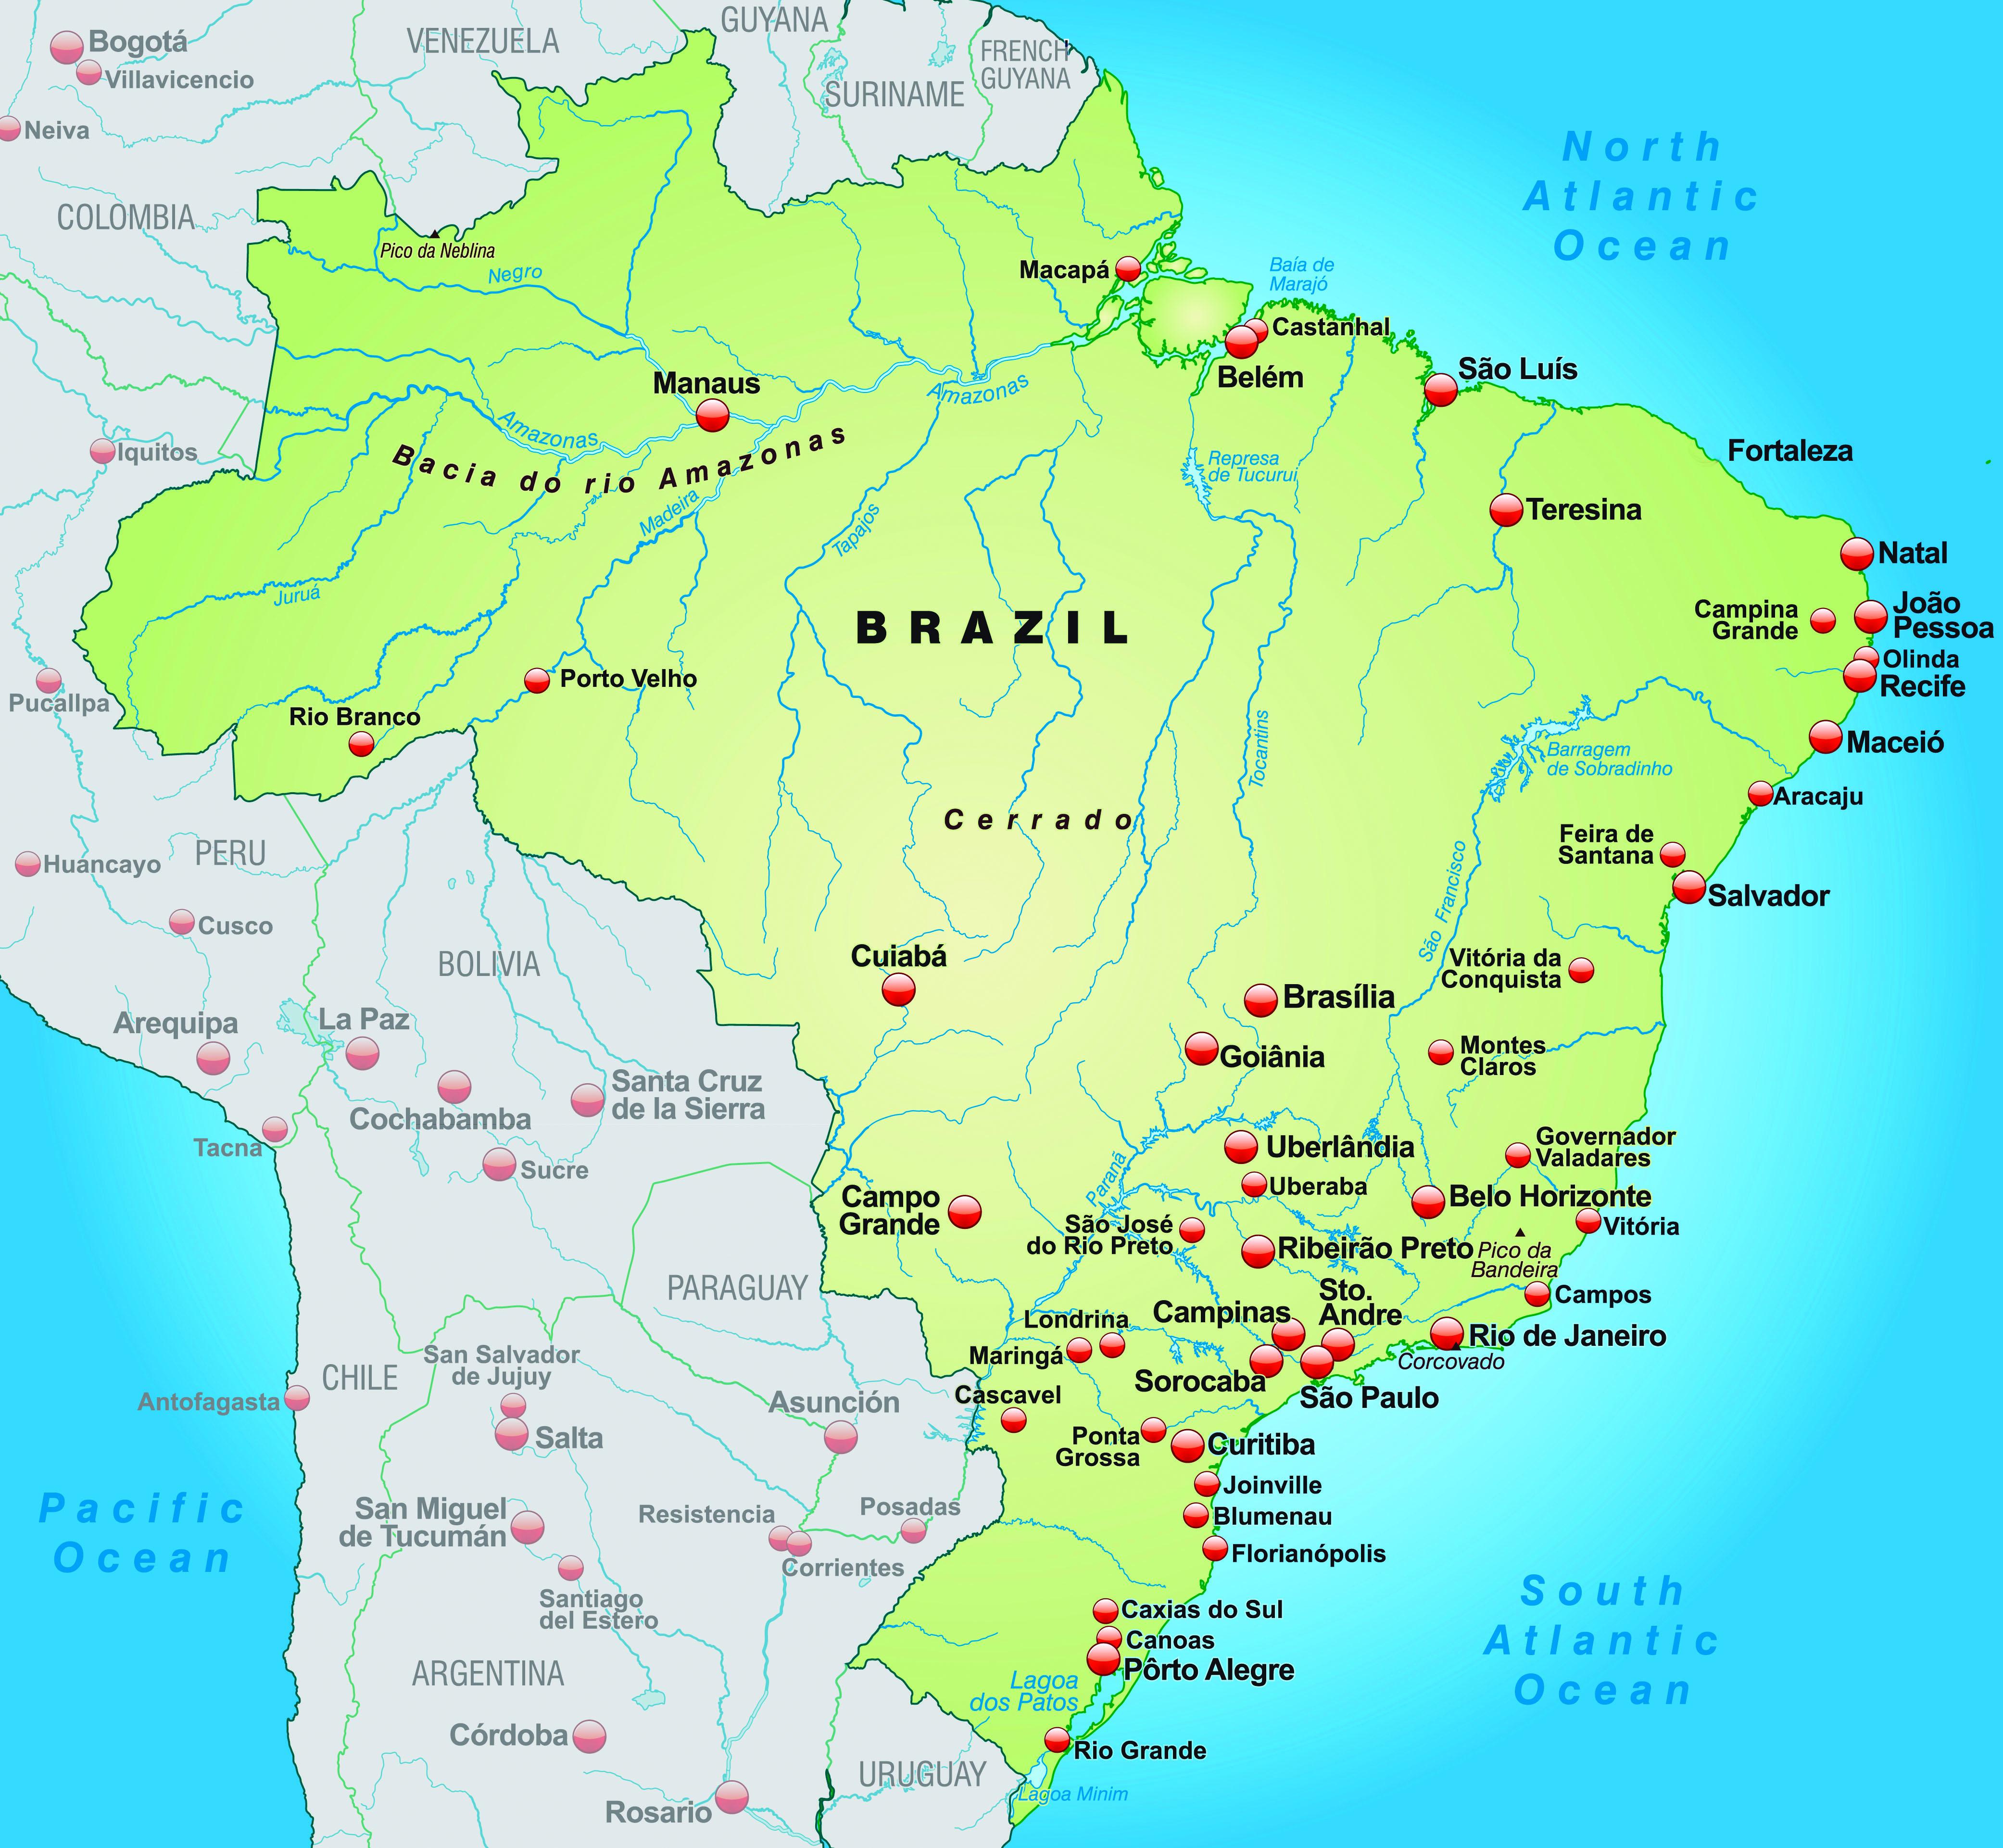 Free photo: Map of Brazil - Amazon, Atlas, Bolivia - Free ...